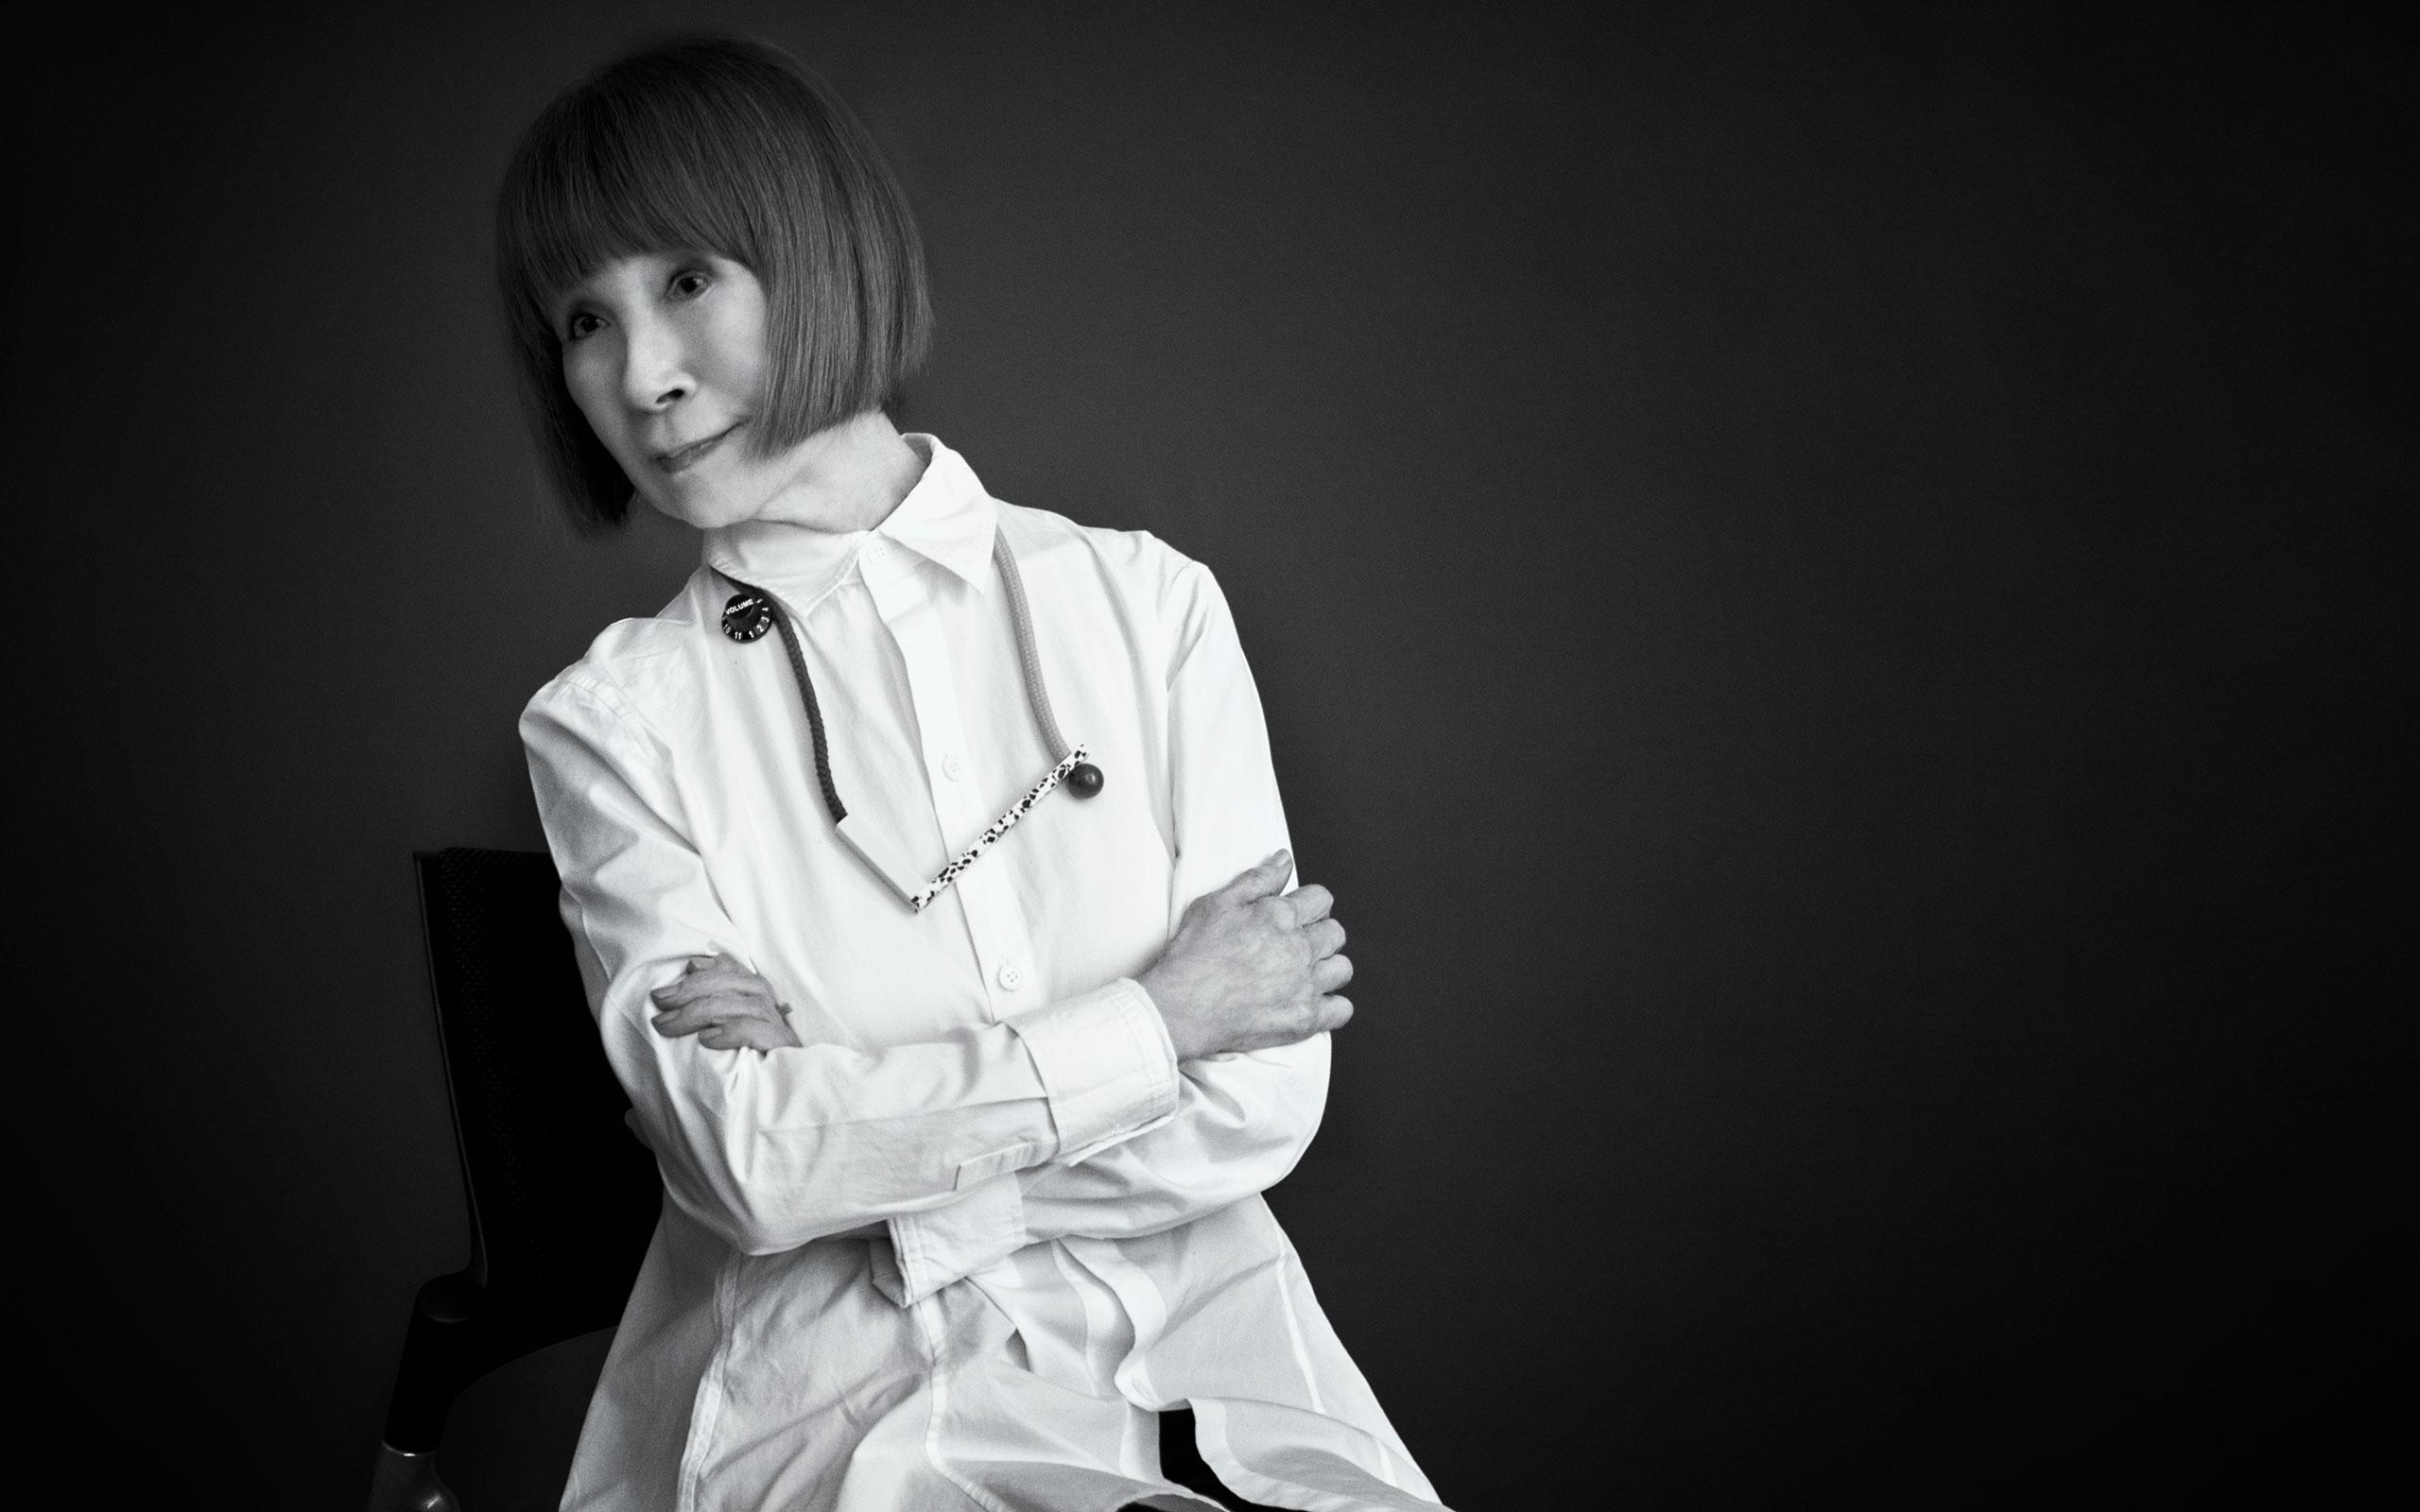 Interview with Harumi Yamaguchi